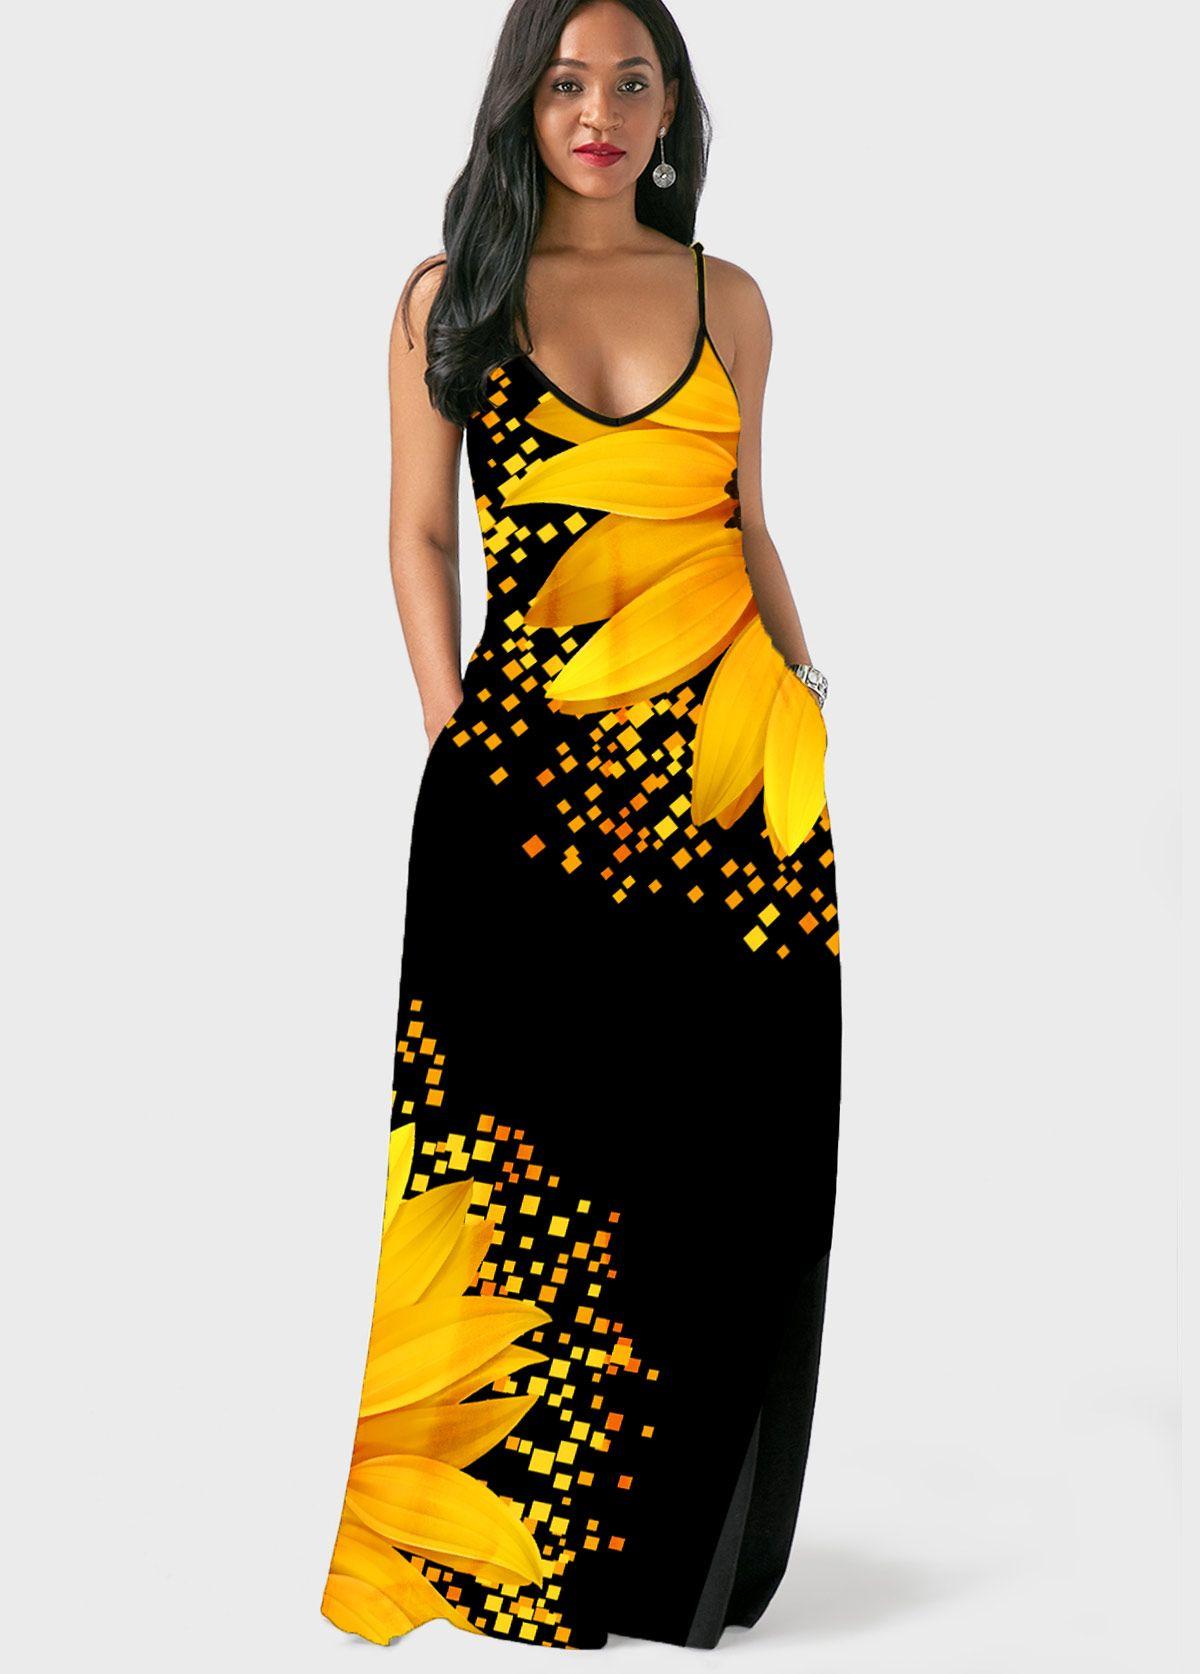 Spaghetti Strap Sunflower Print Side Pocket Maxi Dress Maxi Dress Pocket Maxi Dress Maxi Dress Tutorials [ 1674 x 1200 Pixel ]